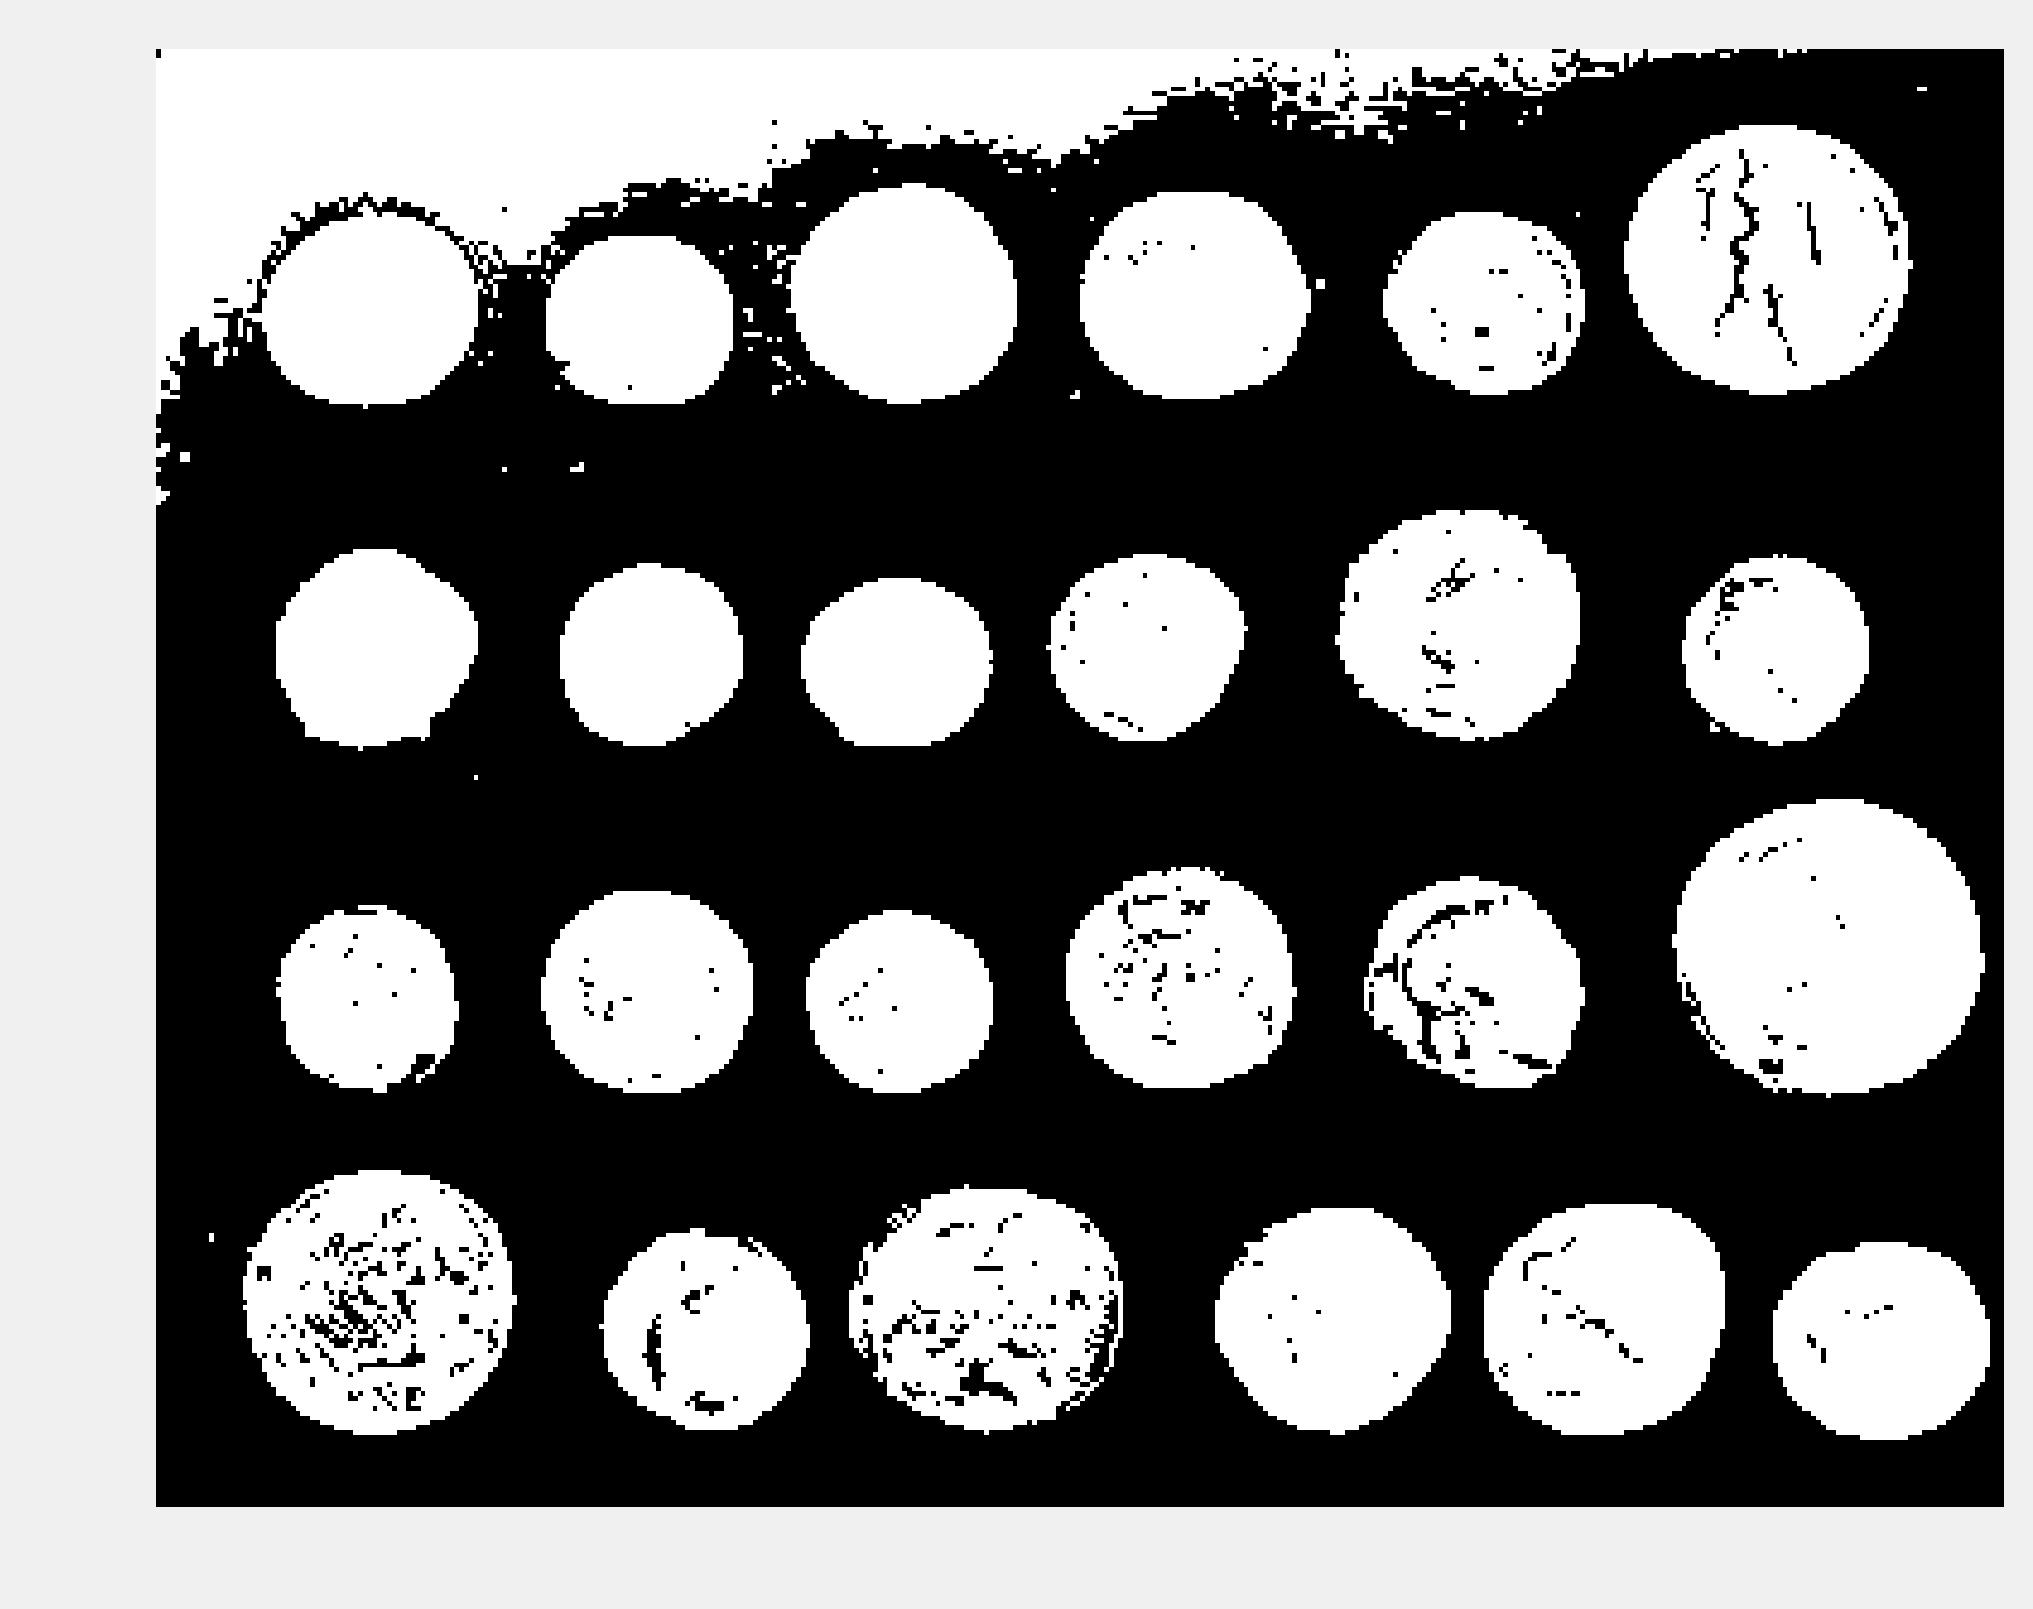 IPython Cookbook - 11 3  Segmenting an image